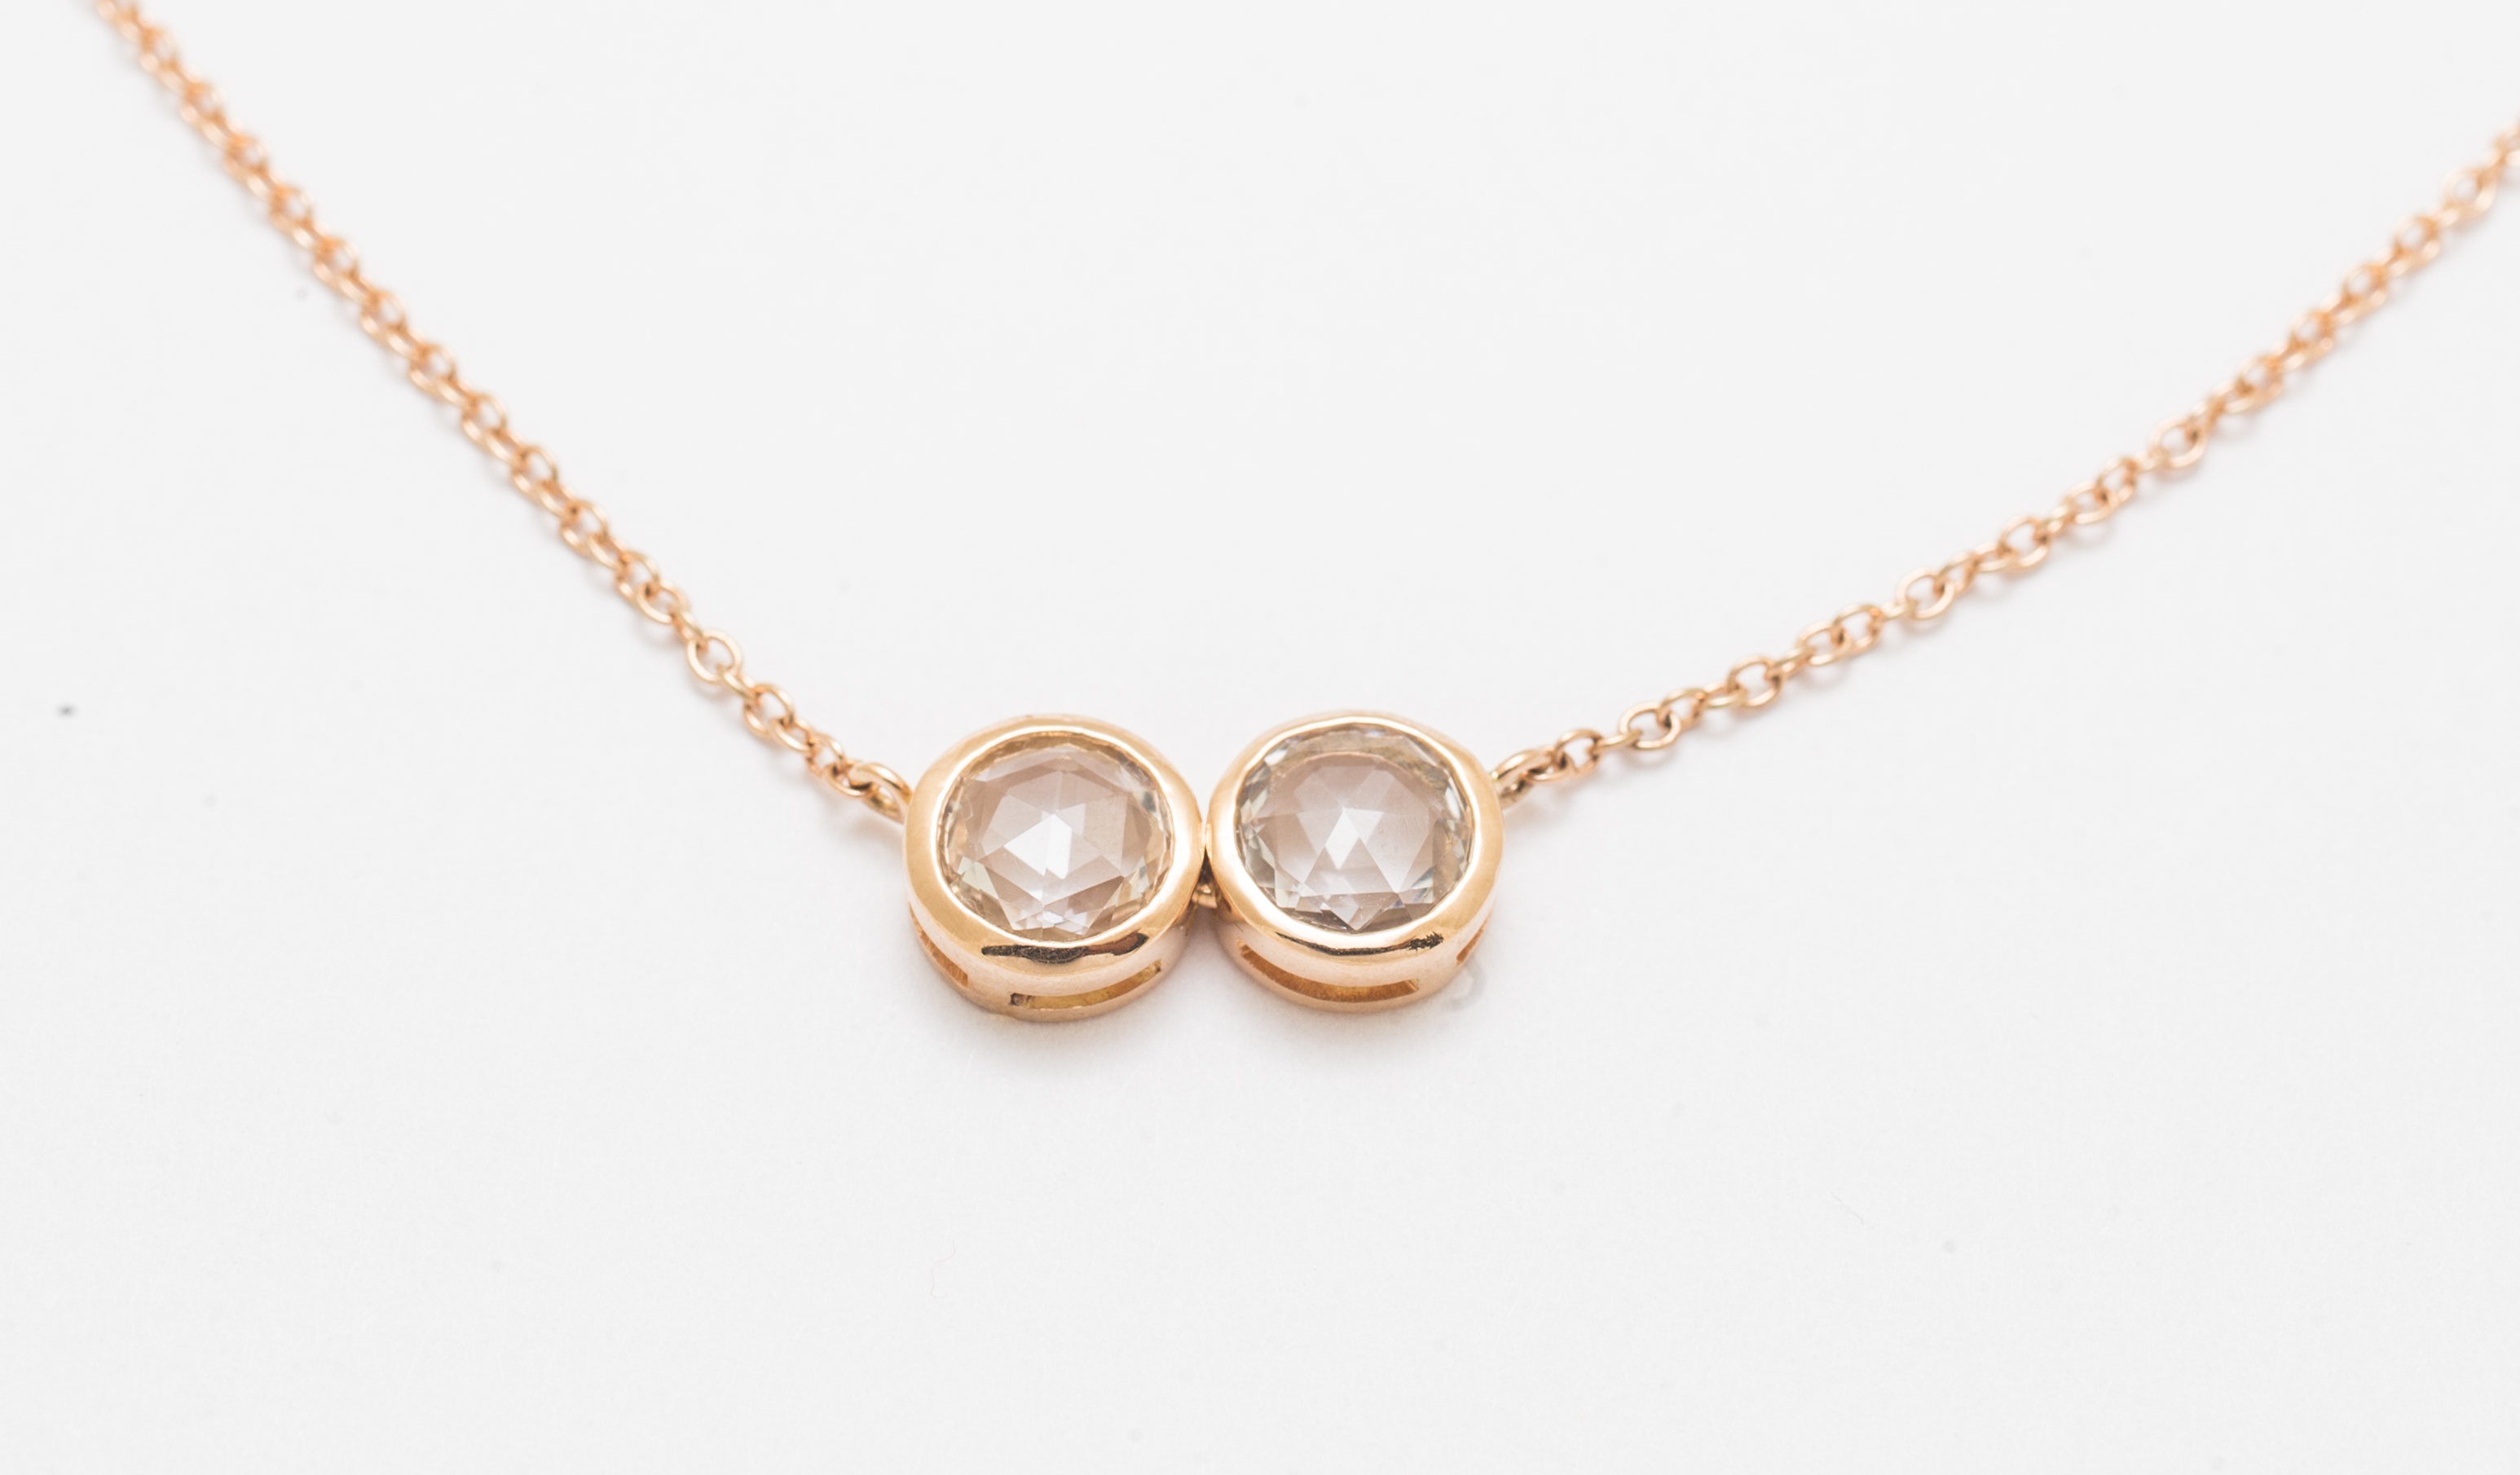 Ola Medanat Jewelry